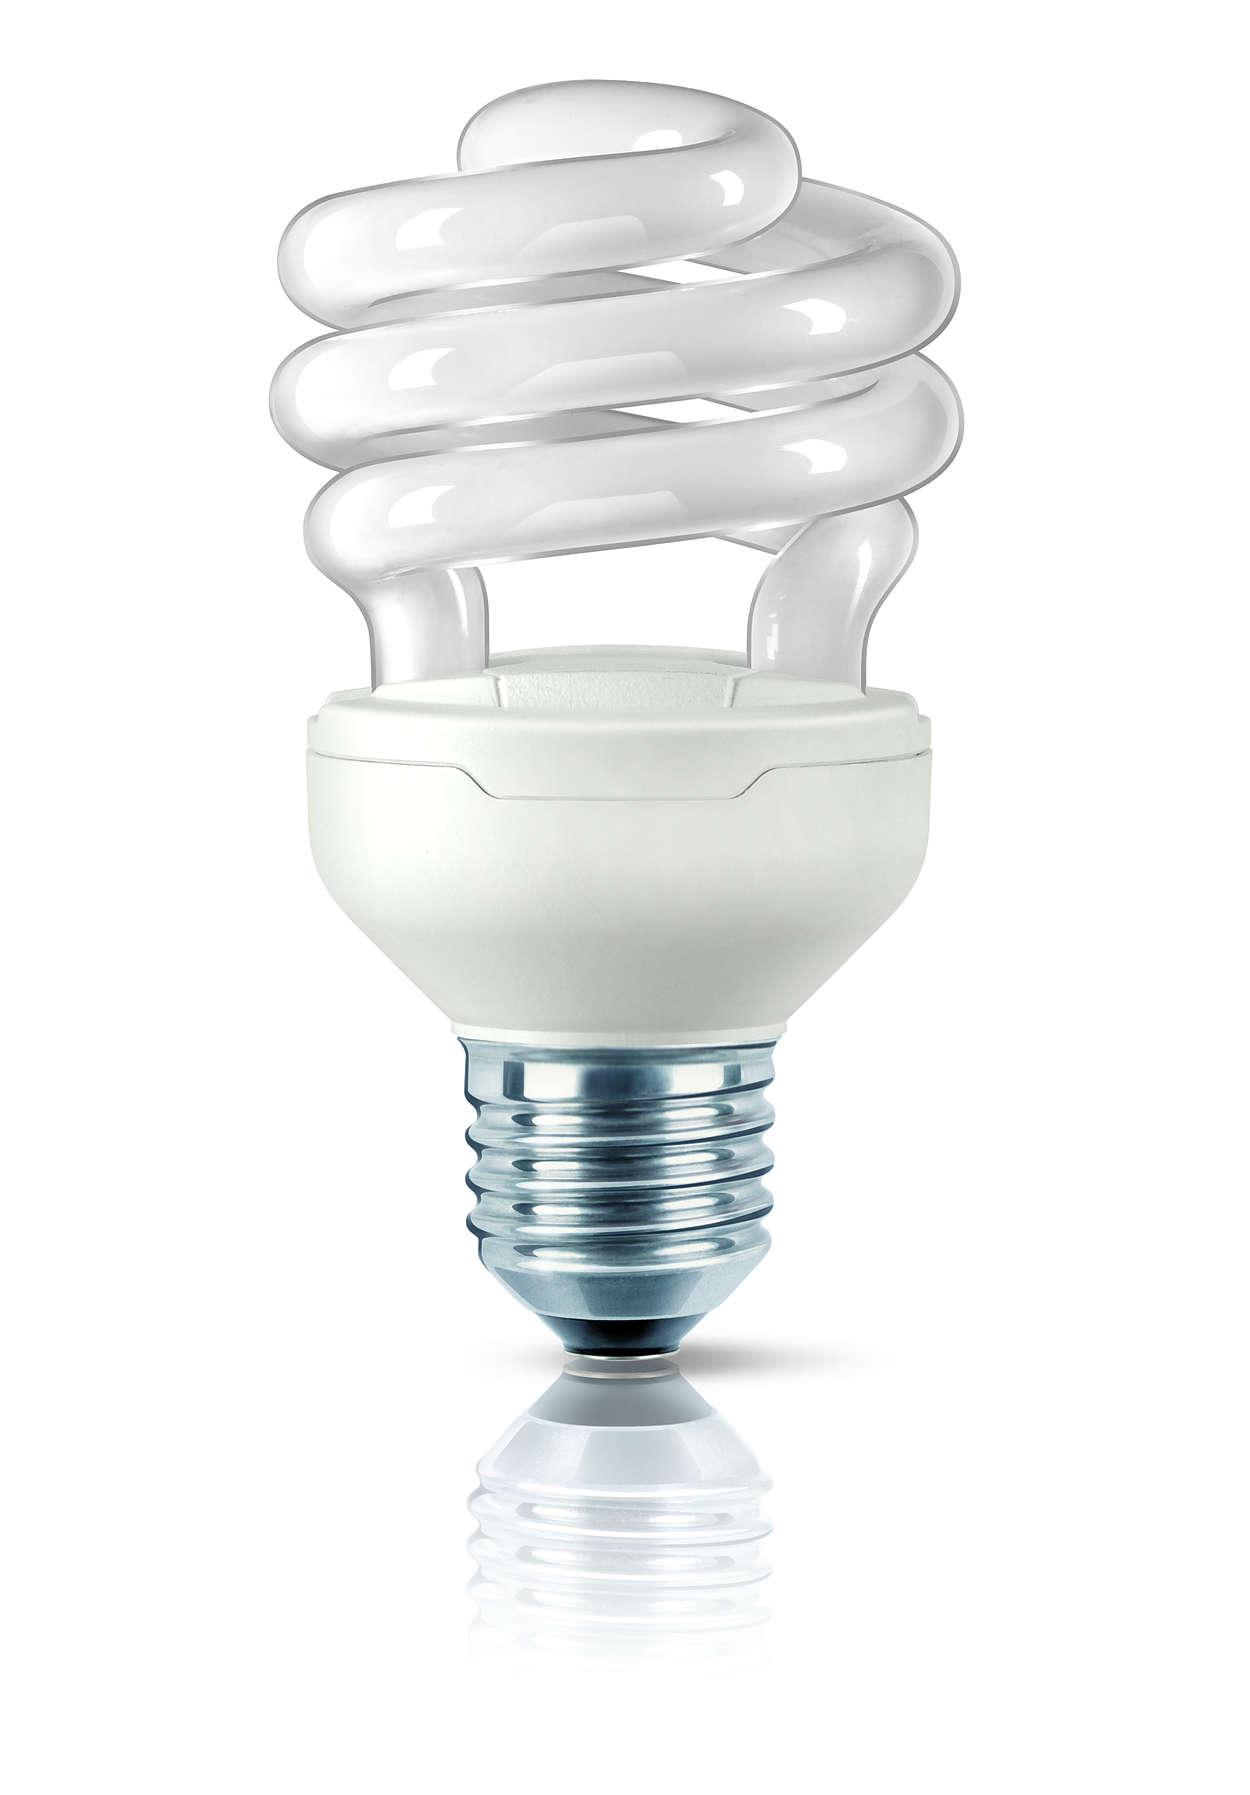 Smallest energy saving lamp